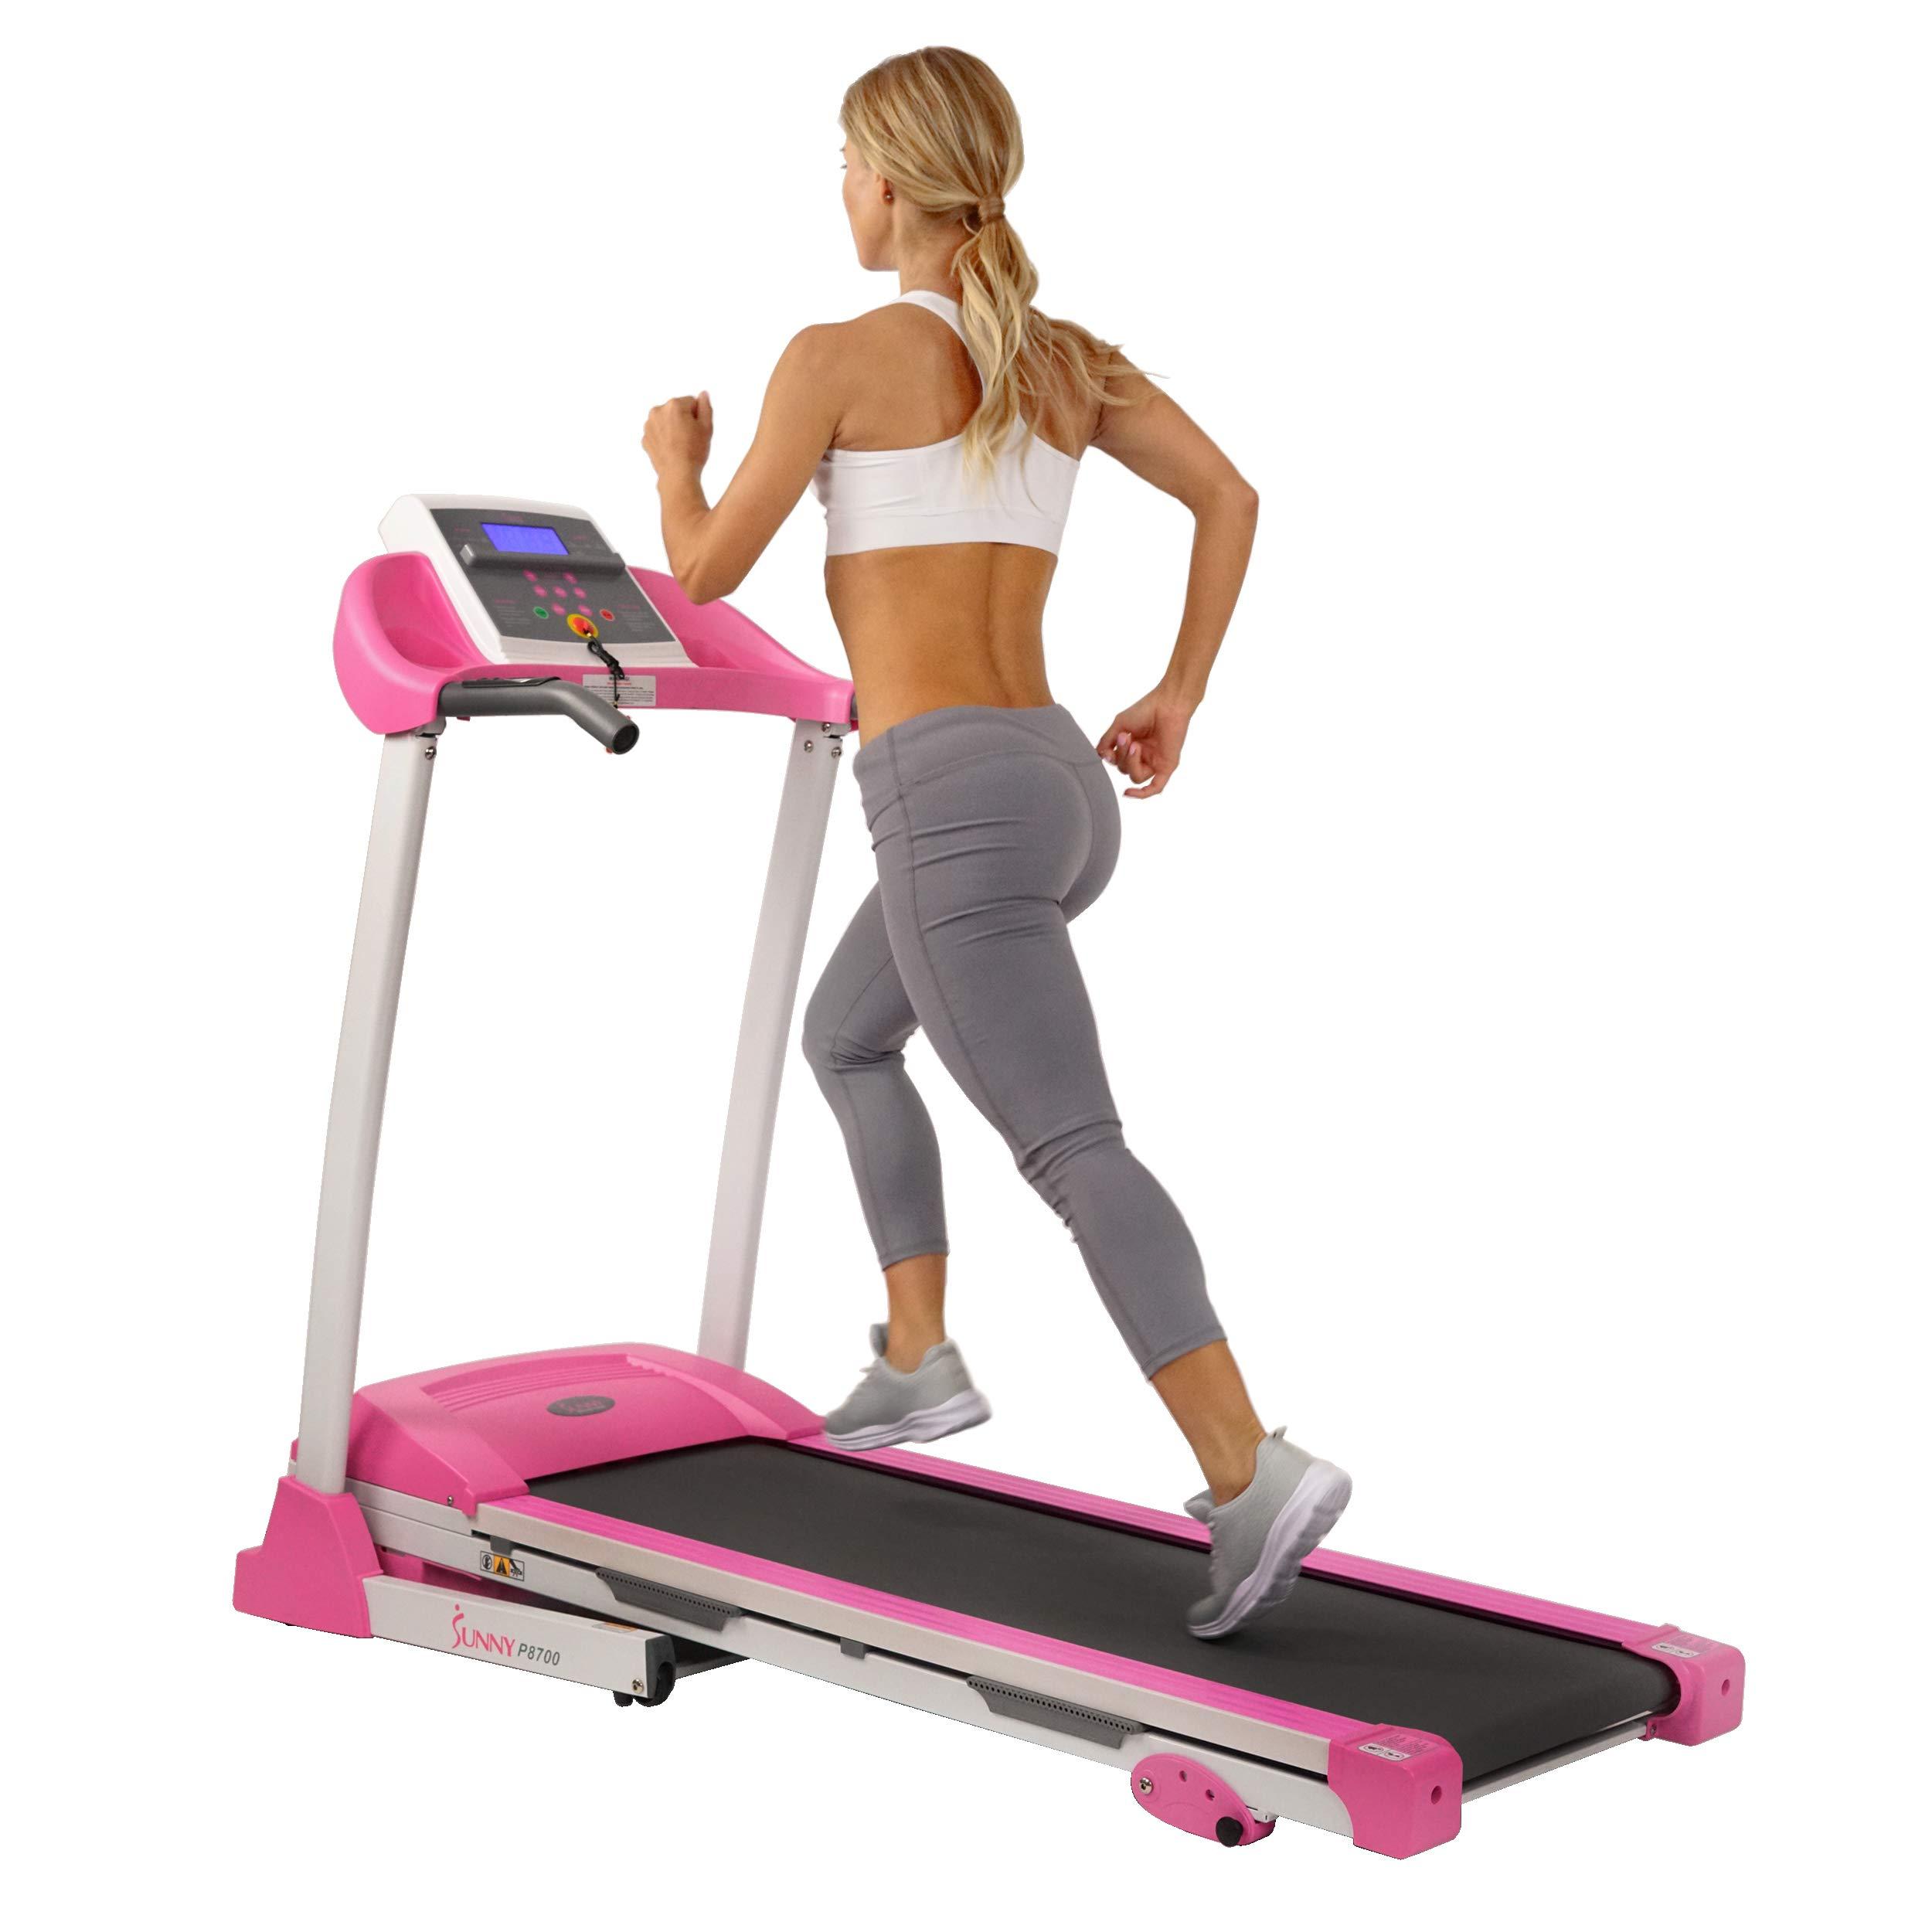 Sunny Health & Fitness P8700 Pink Treadmill by Sunny Health & Fitness (Image #4)